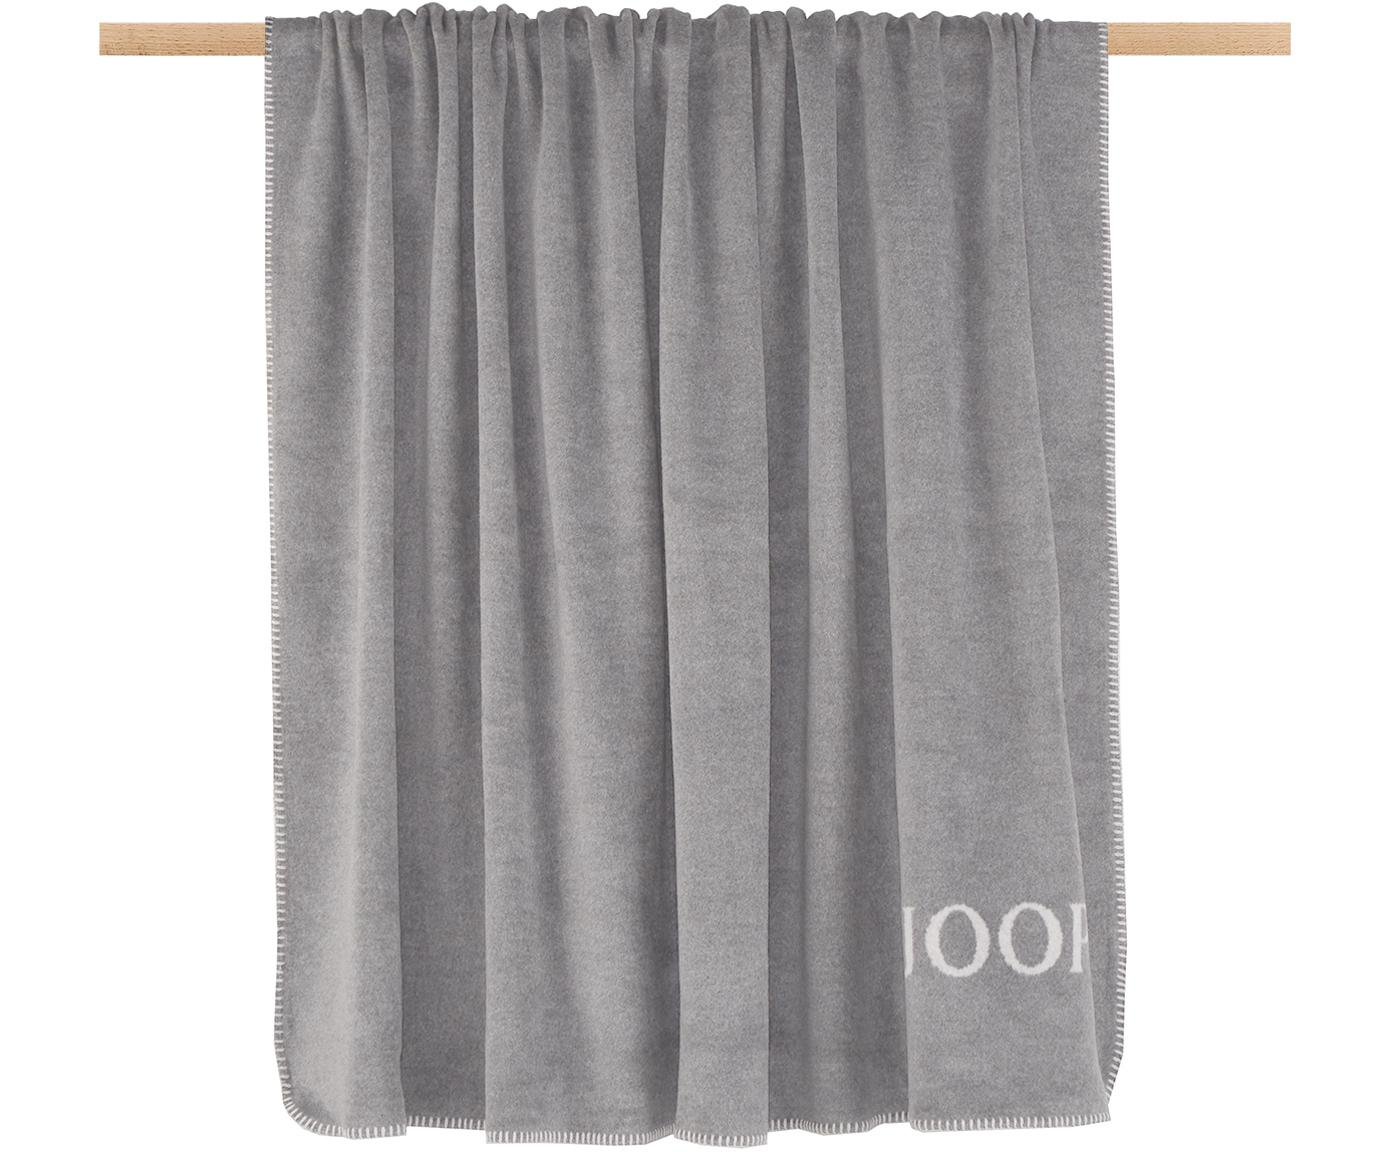 Fleece-Wendeplaid Uni Doubleface in Grau und Weiß, 58%Baumwolle, 35%Polyacryl, 7%Polyester, Grau, Weiß, 150 x 200 cm